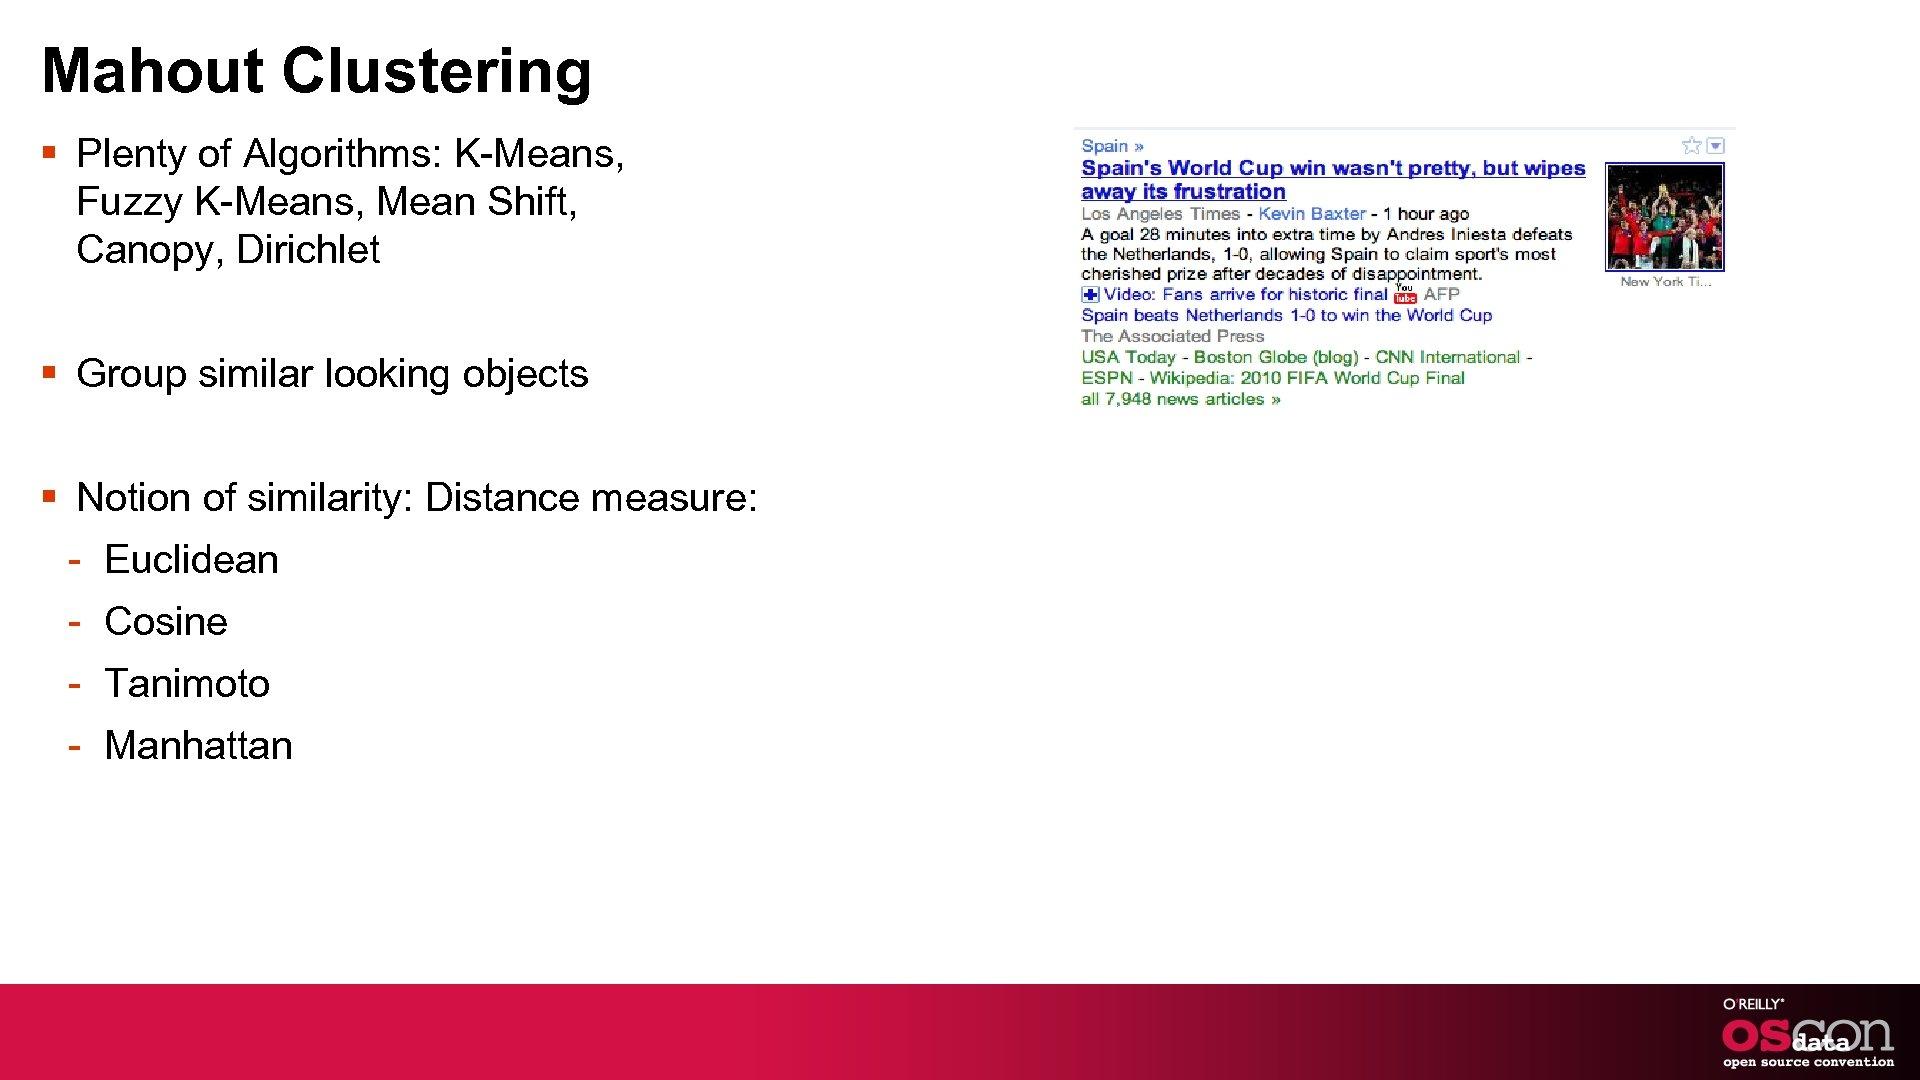 Mahout Clustering § Plenty of Algorithms: K-Means, Fuzzy K-Means, Mean Shift, Canopy, Dirichlet §